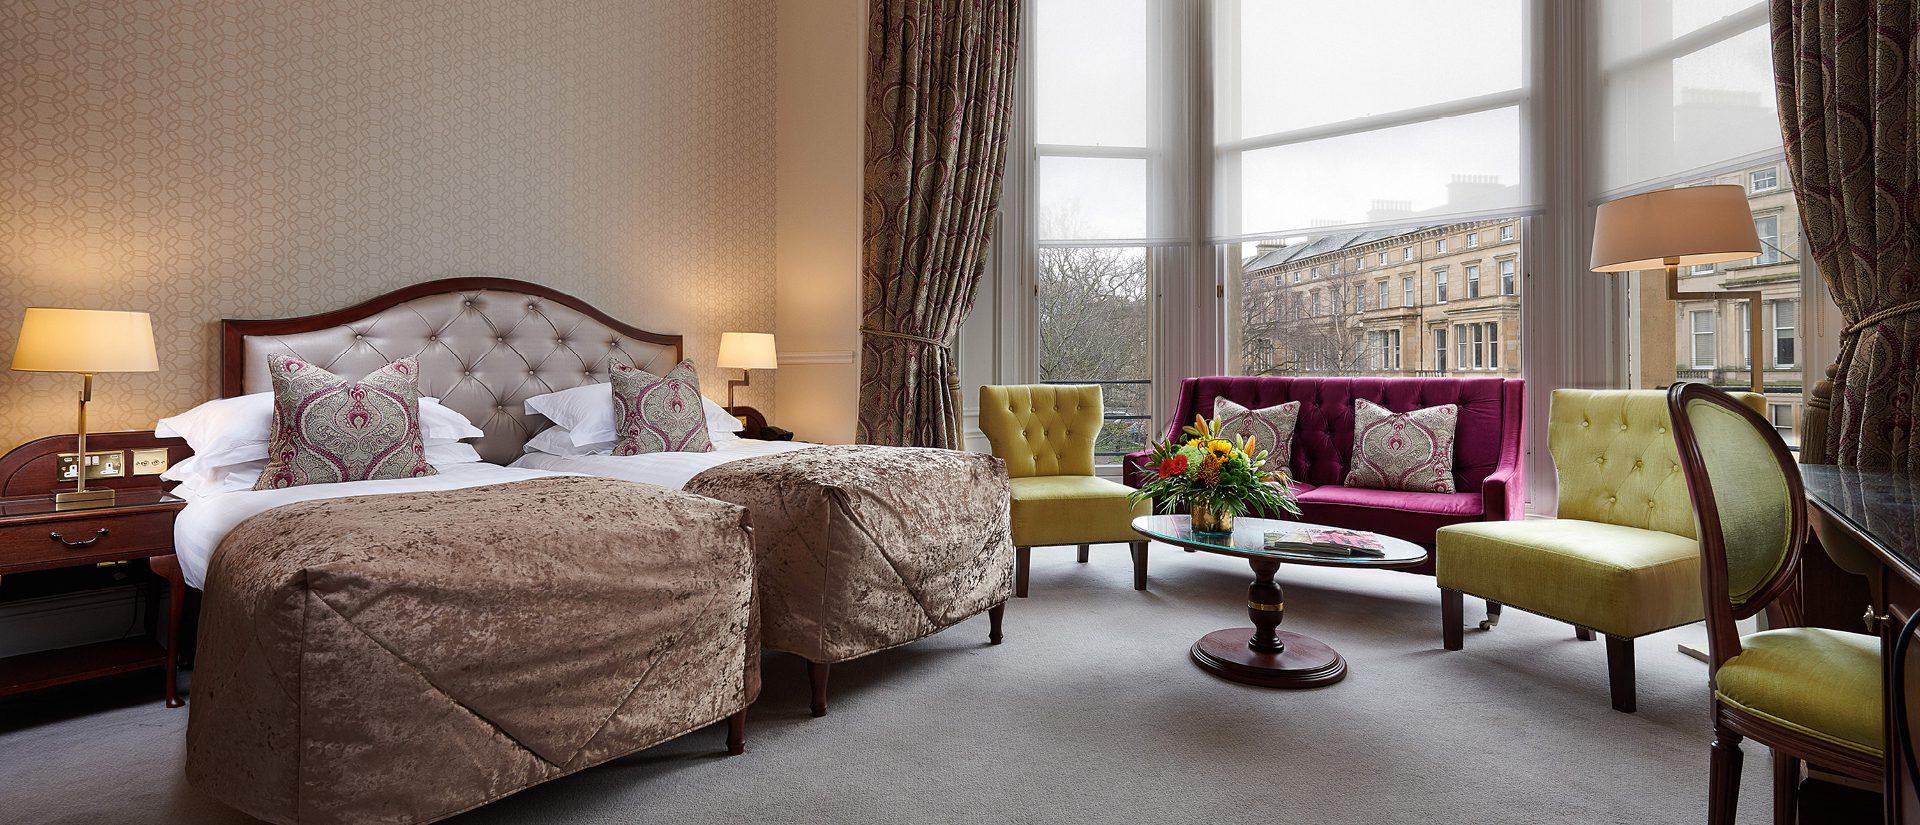 The Bonham Hotel Superior Bedroom